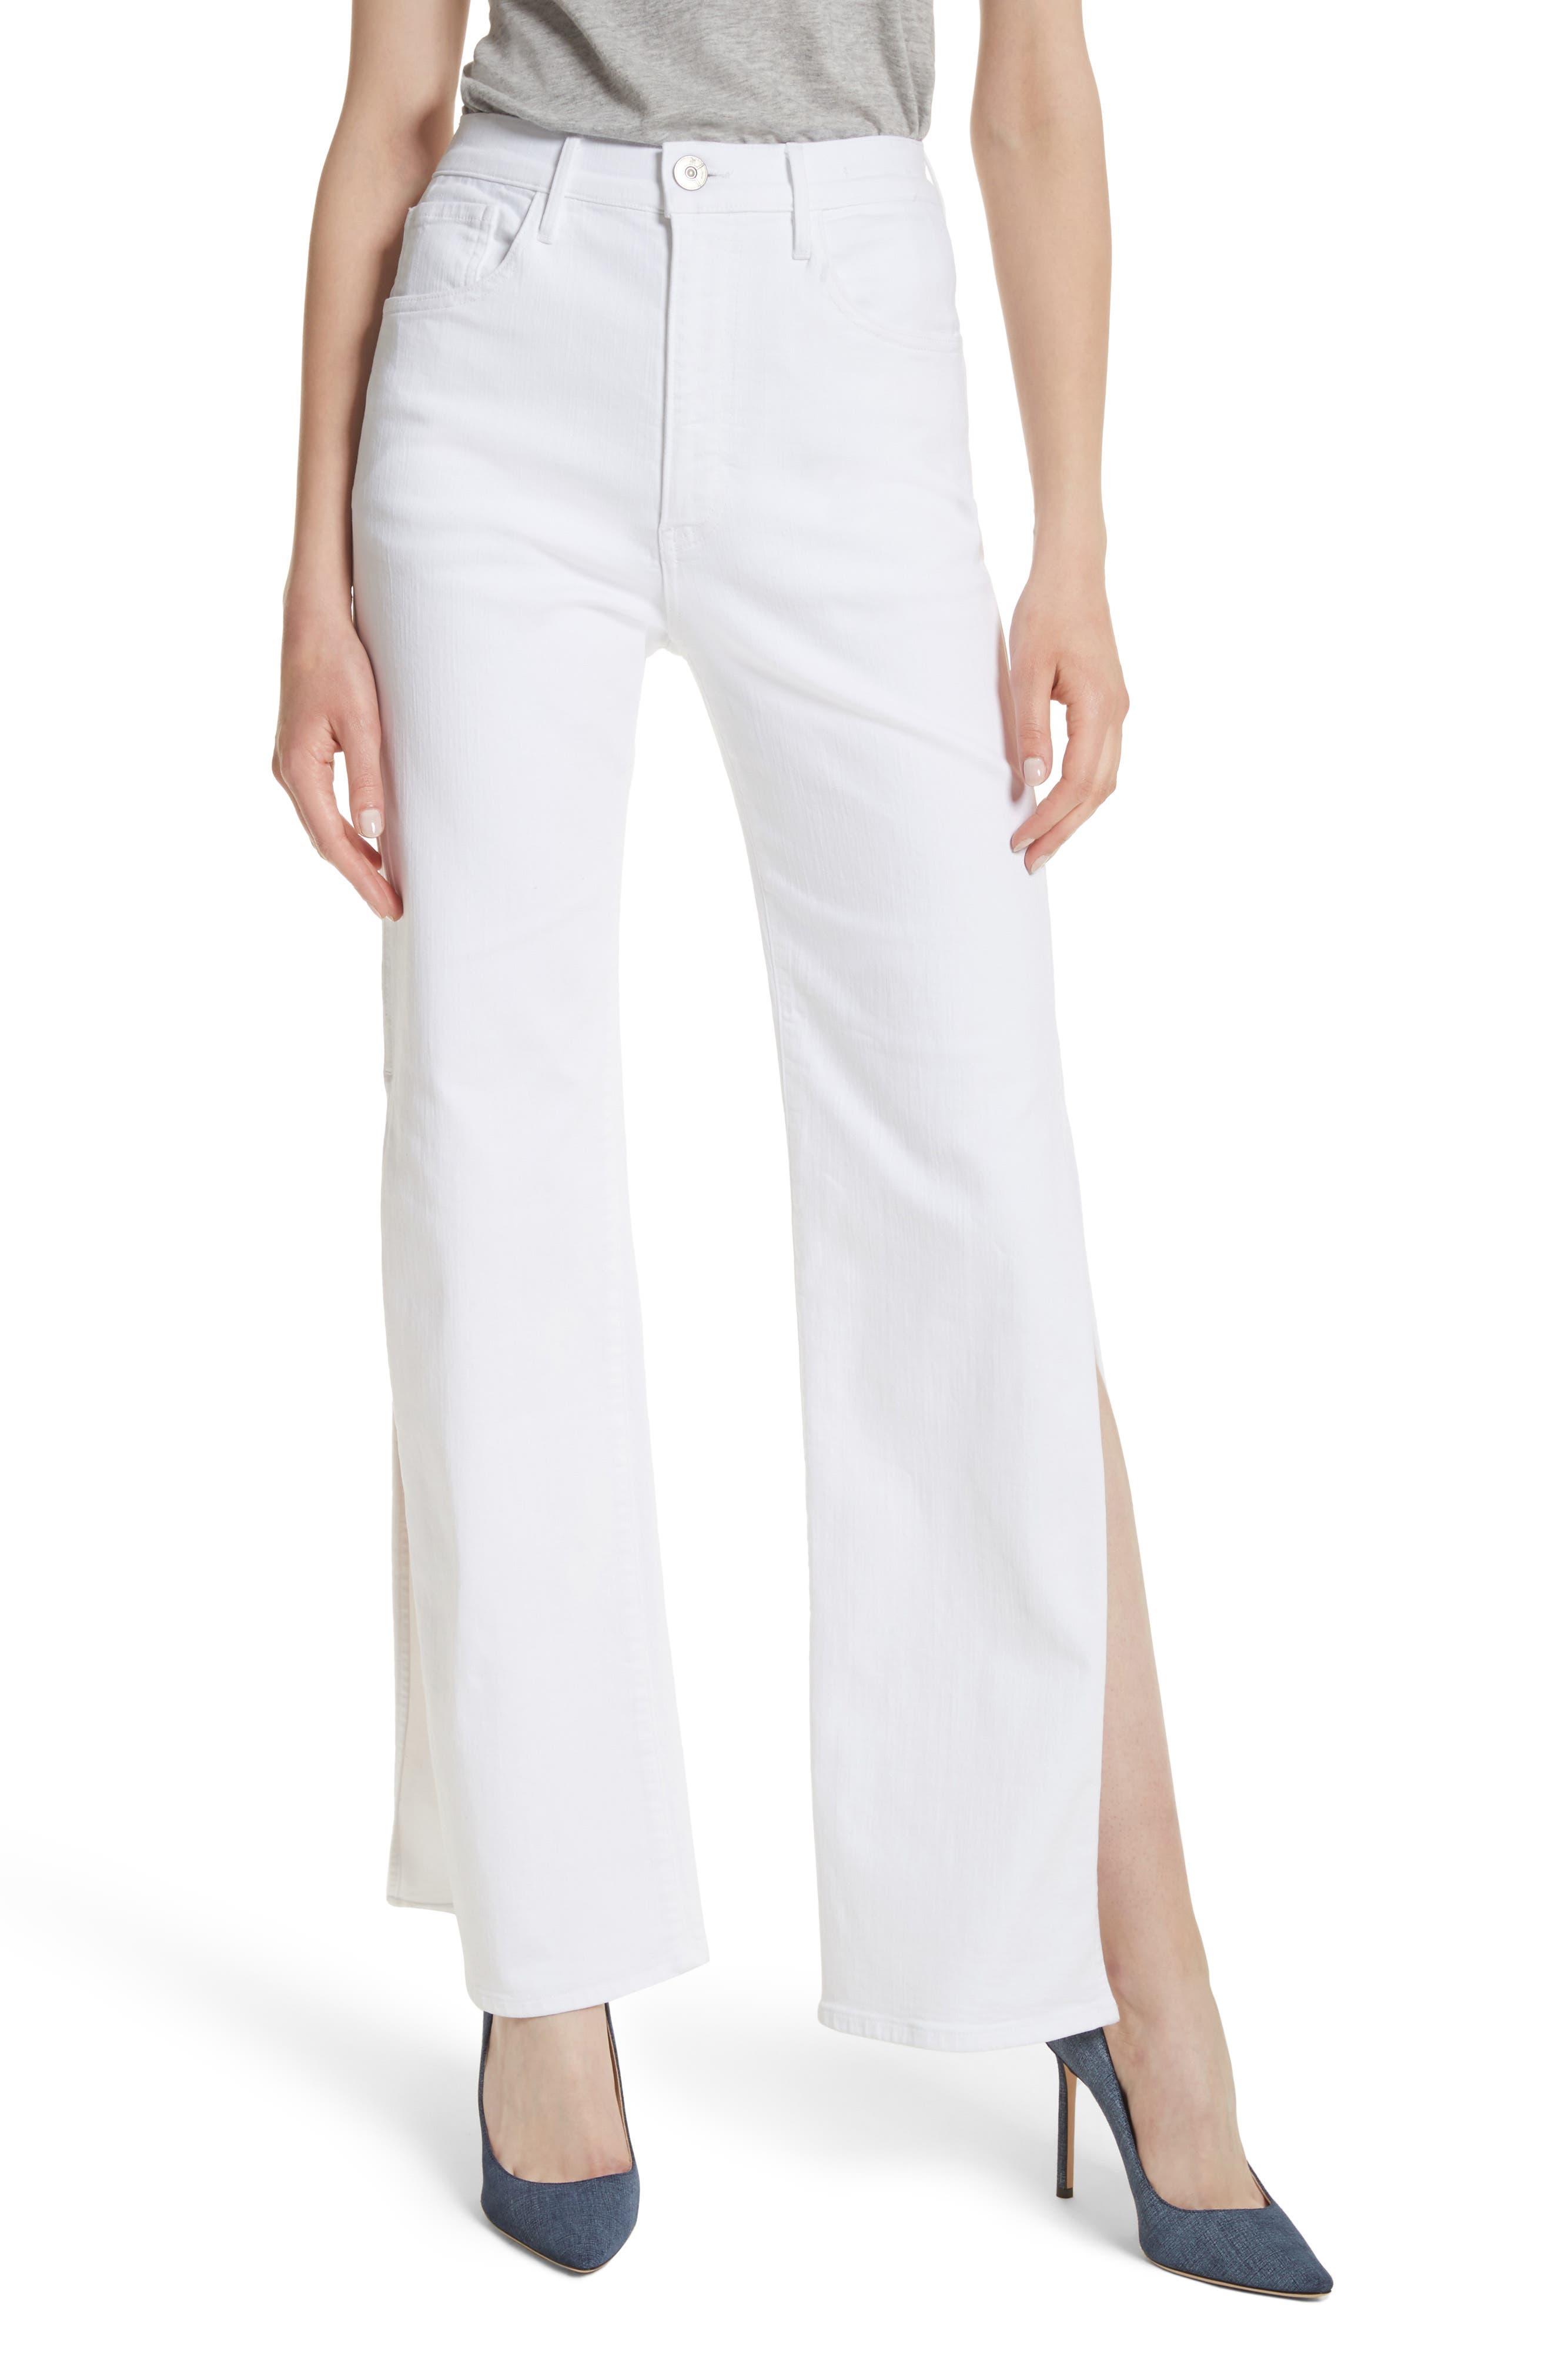 W4 Adeline Split Leg Flare Jeans,                         Main,                         color, ASPRO